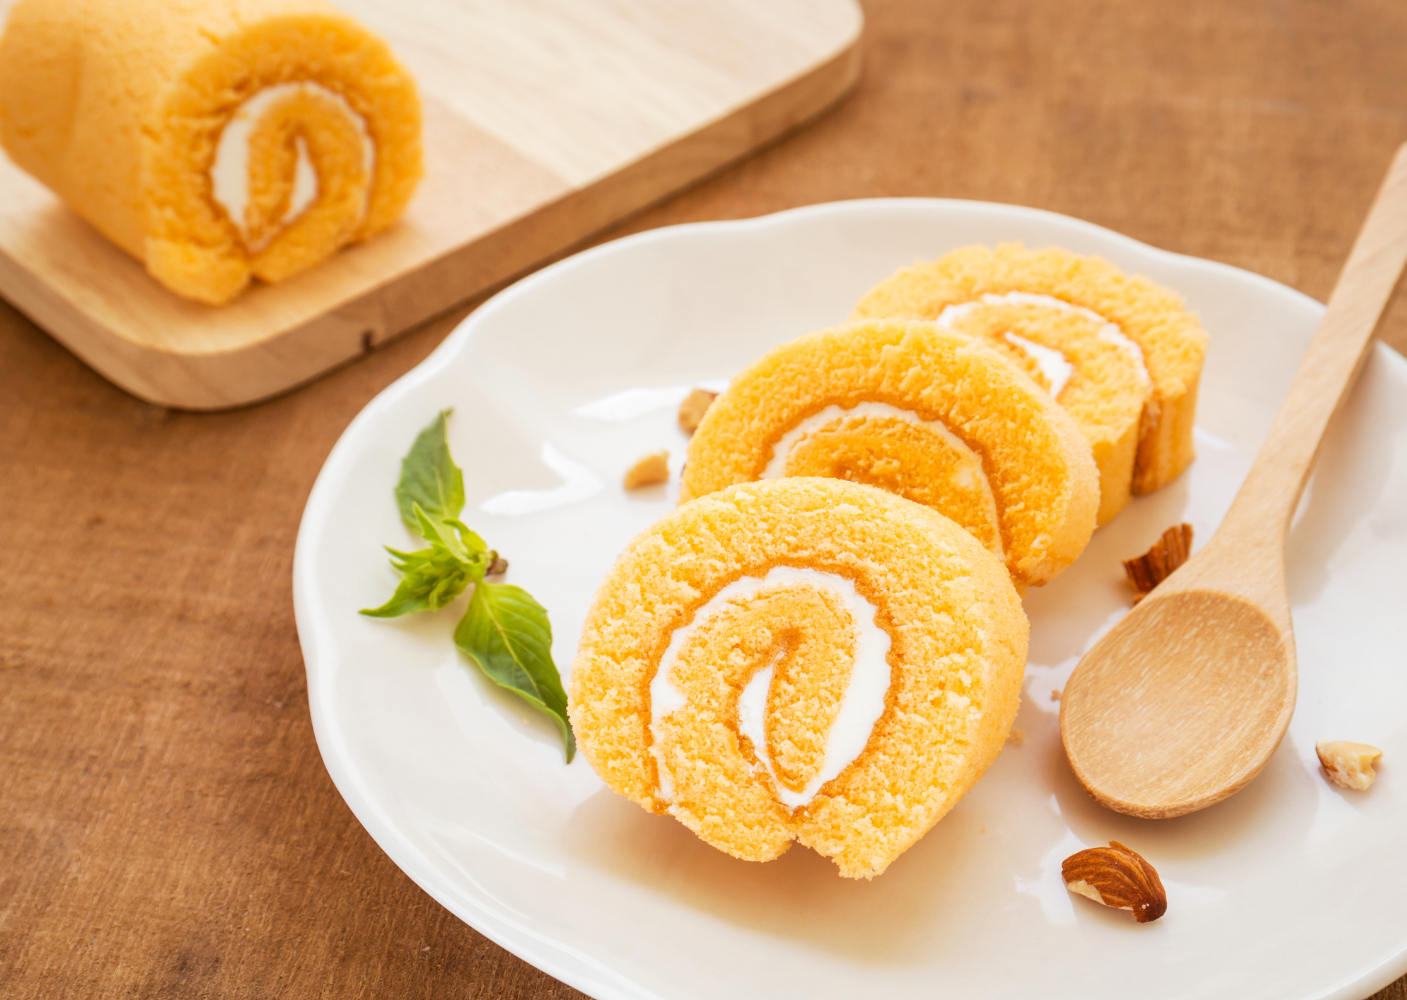 torta de laranja com creme de pasteleiro